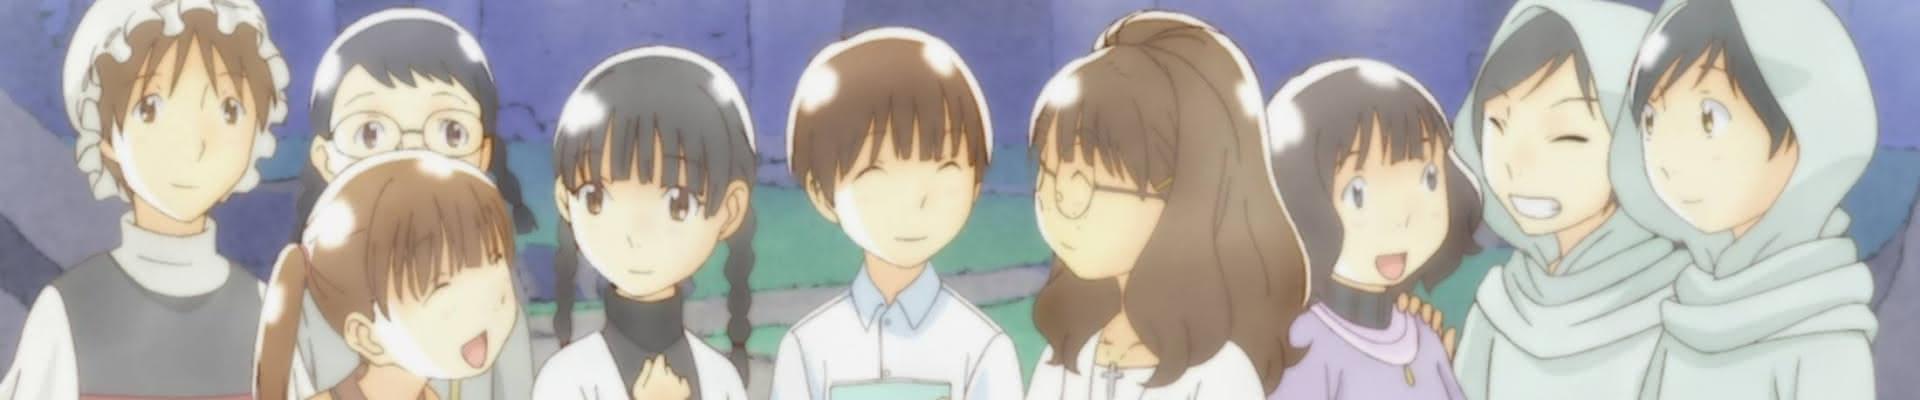 Hourou Musuko